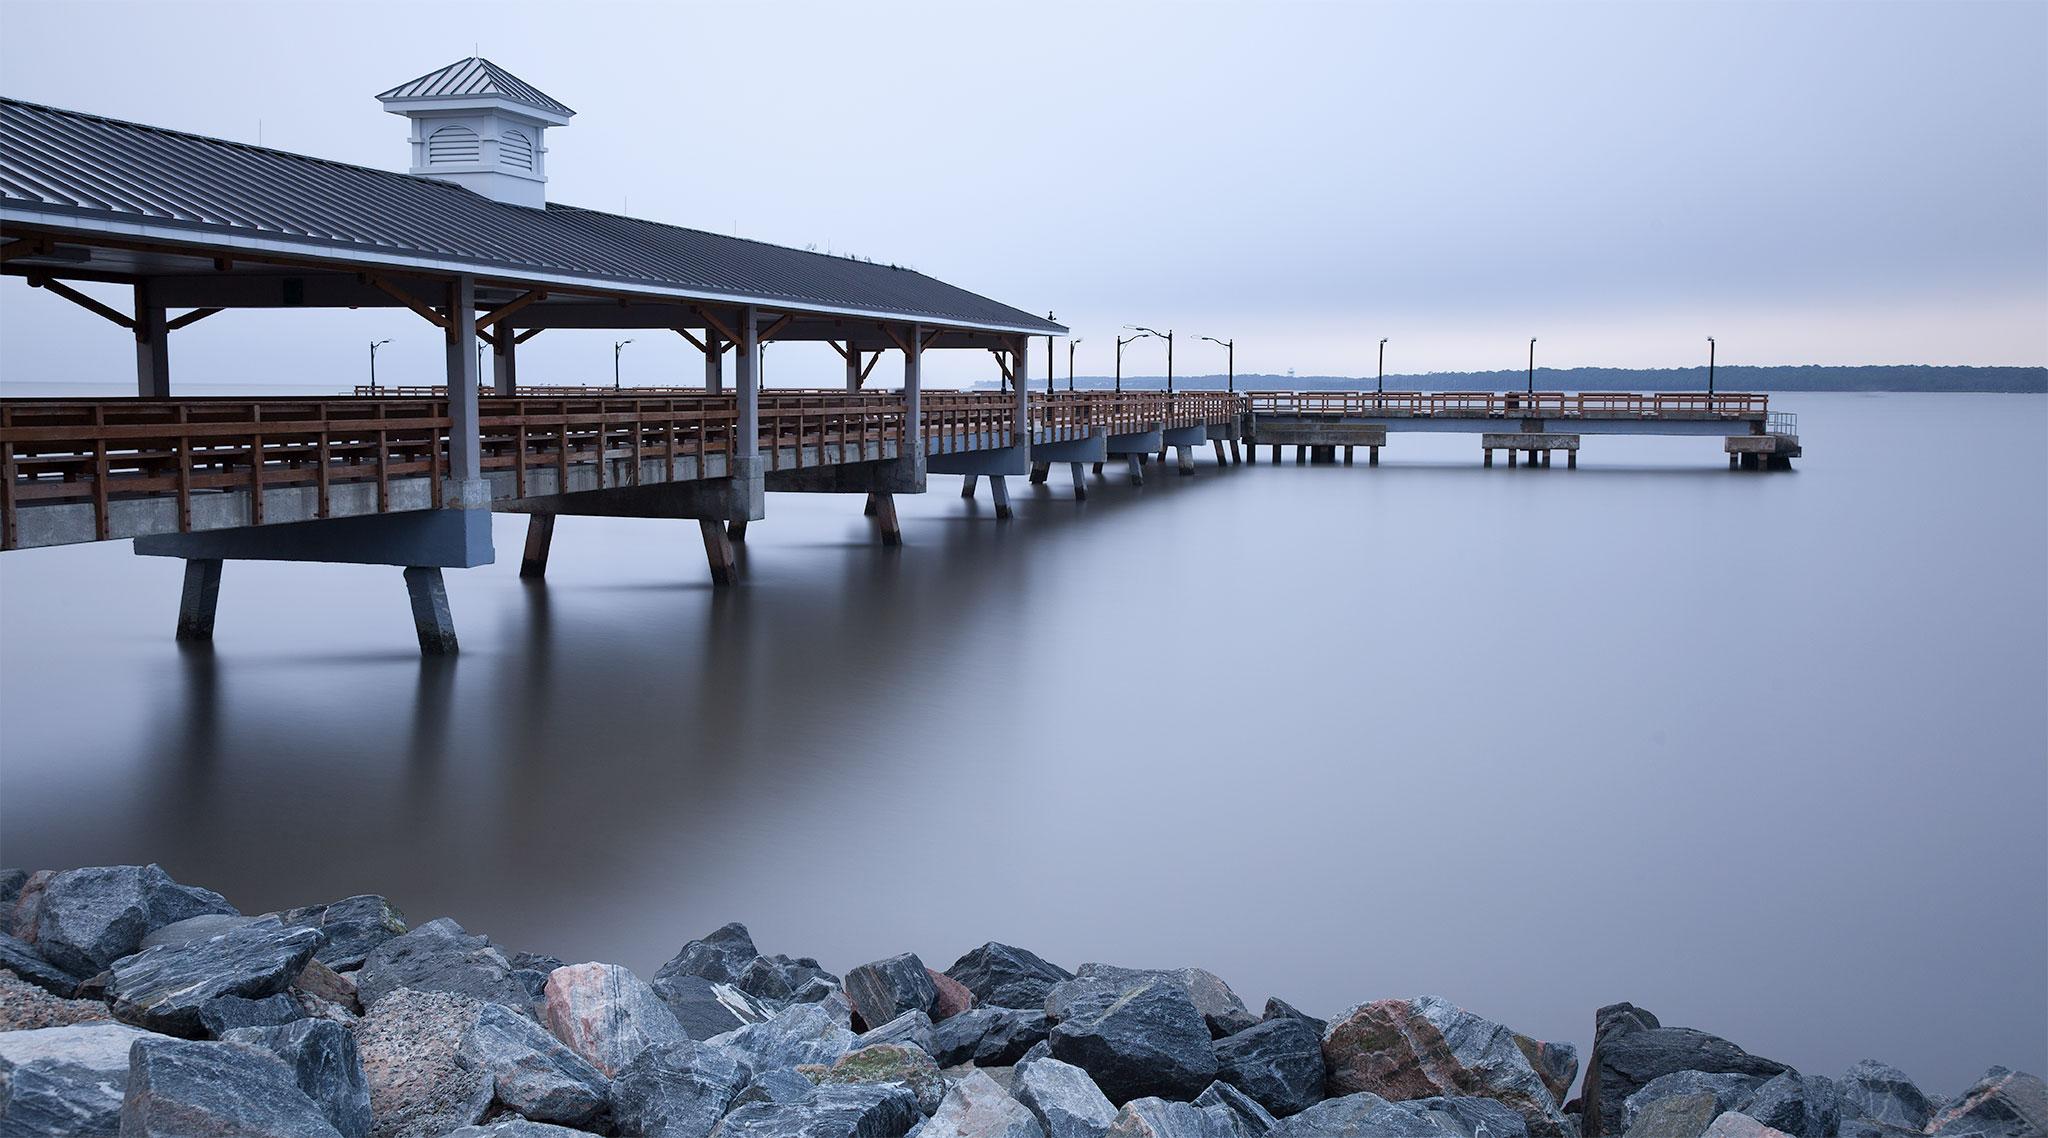 St. Simon's Island Fishing Pier